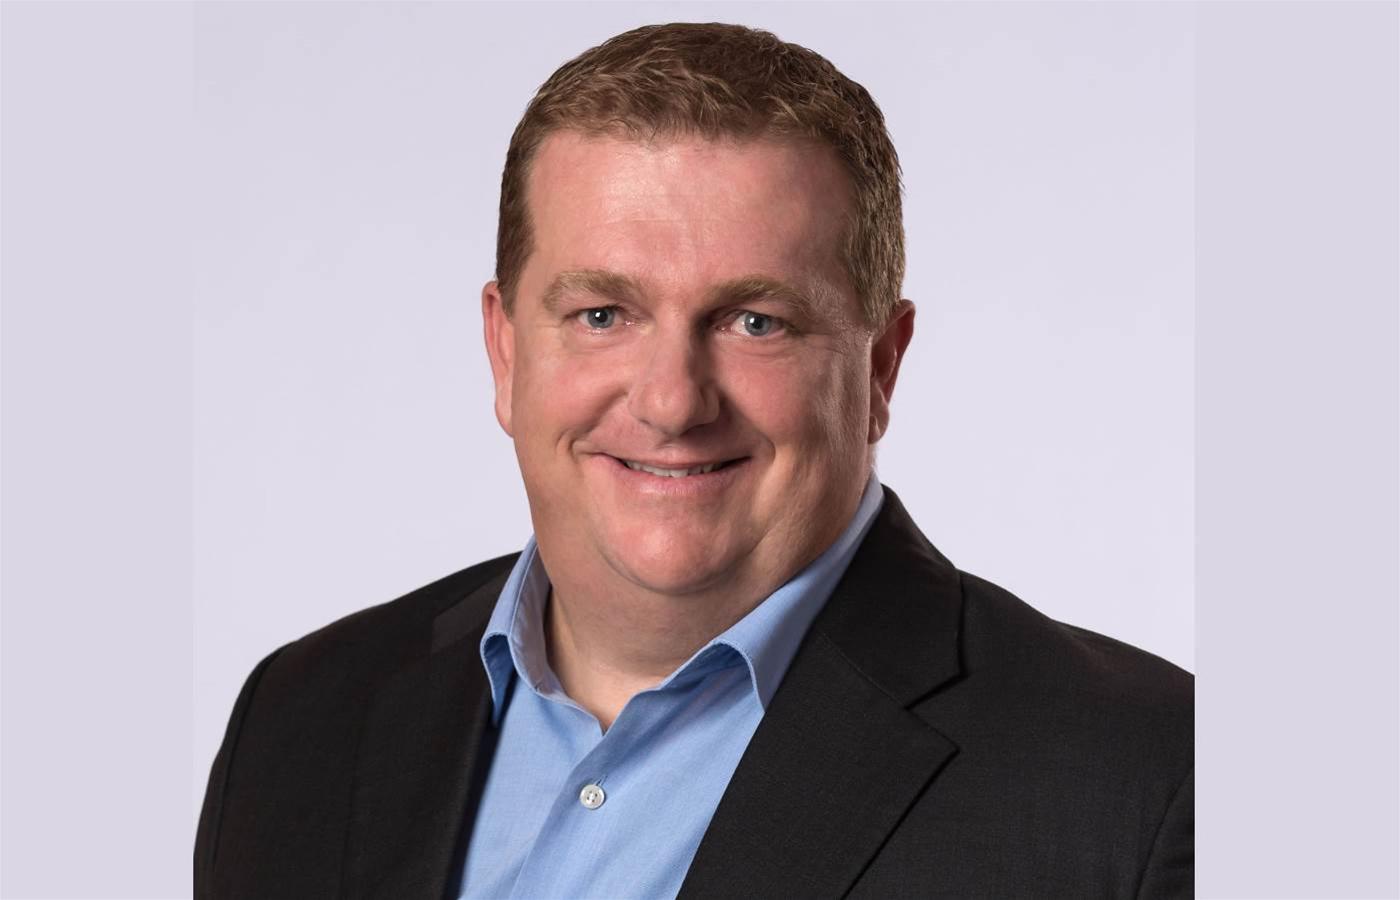 Hitachi Vantara appoints Mark Ablett to global leadership team